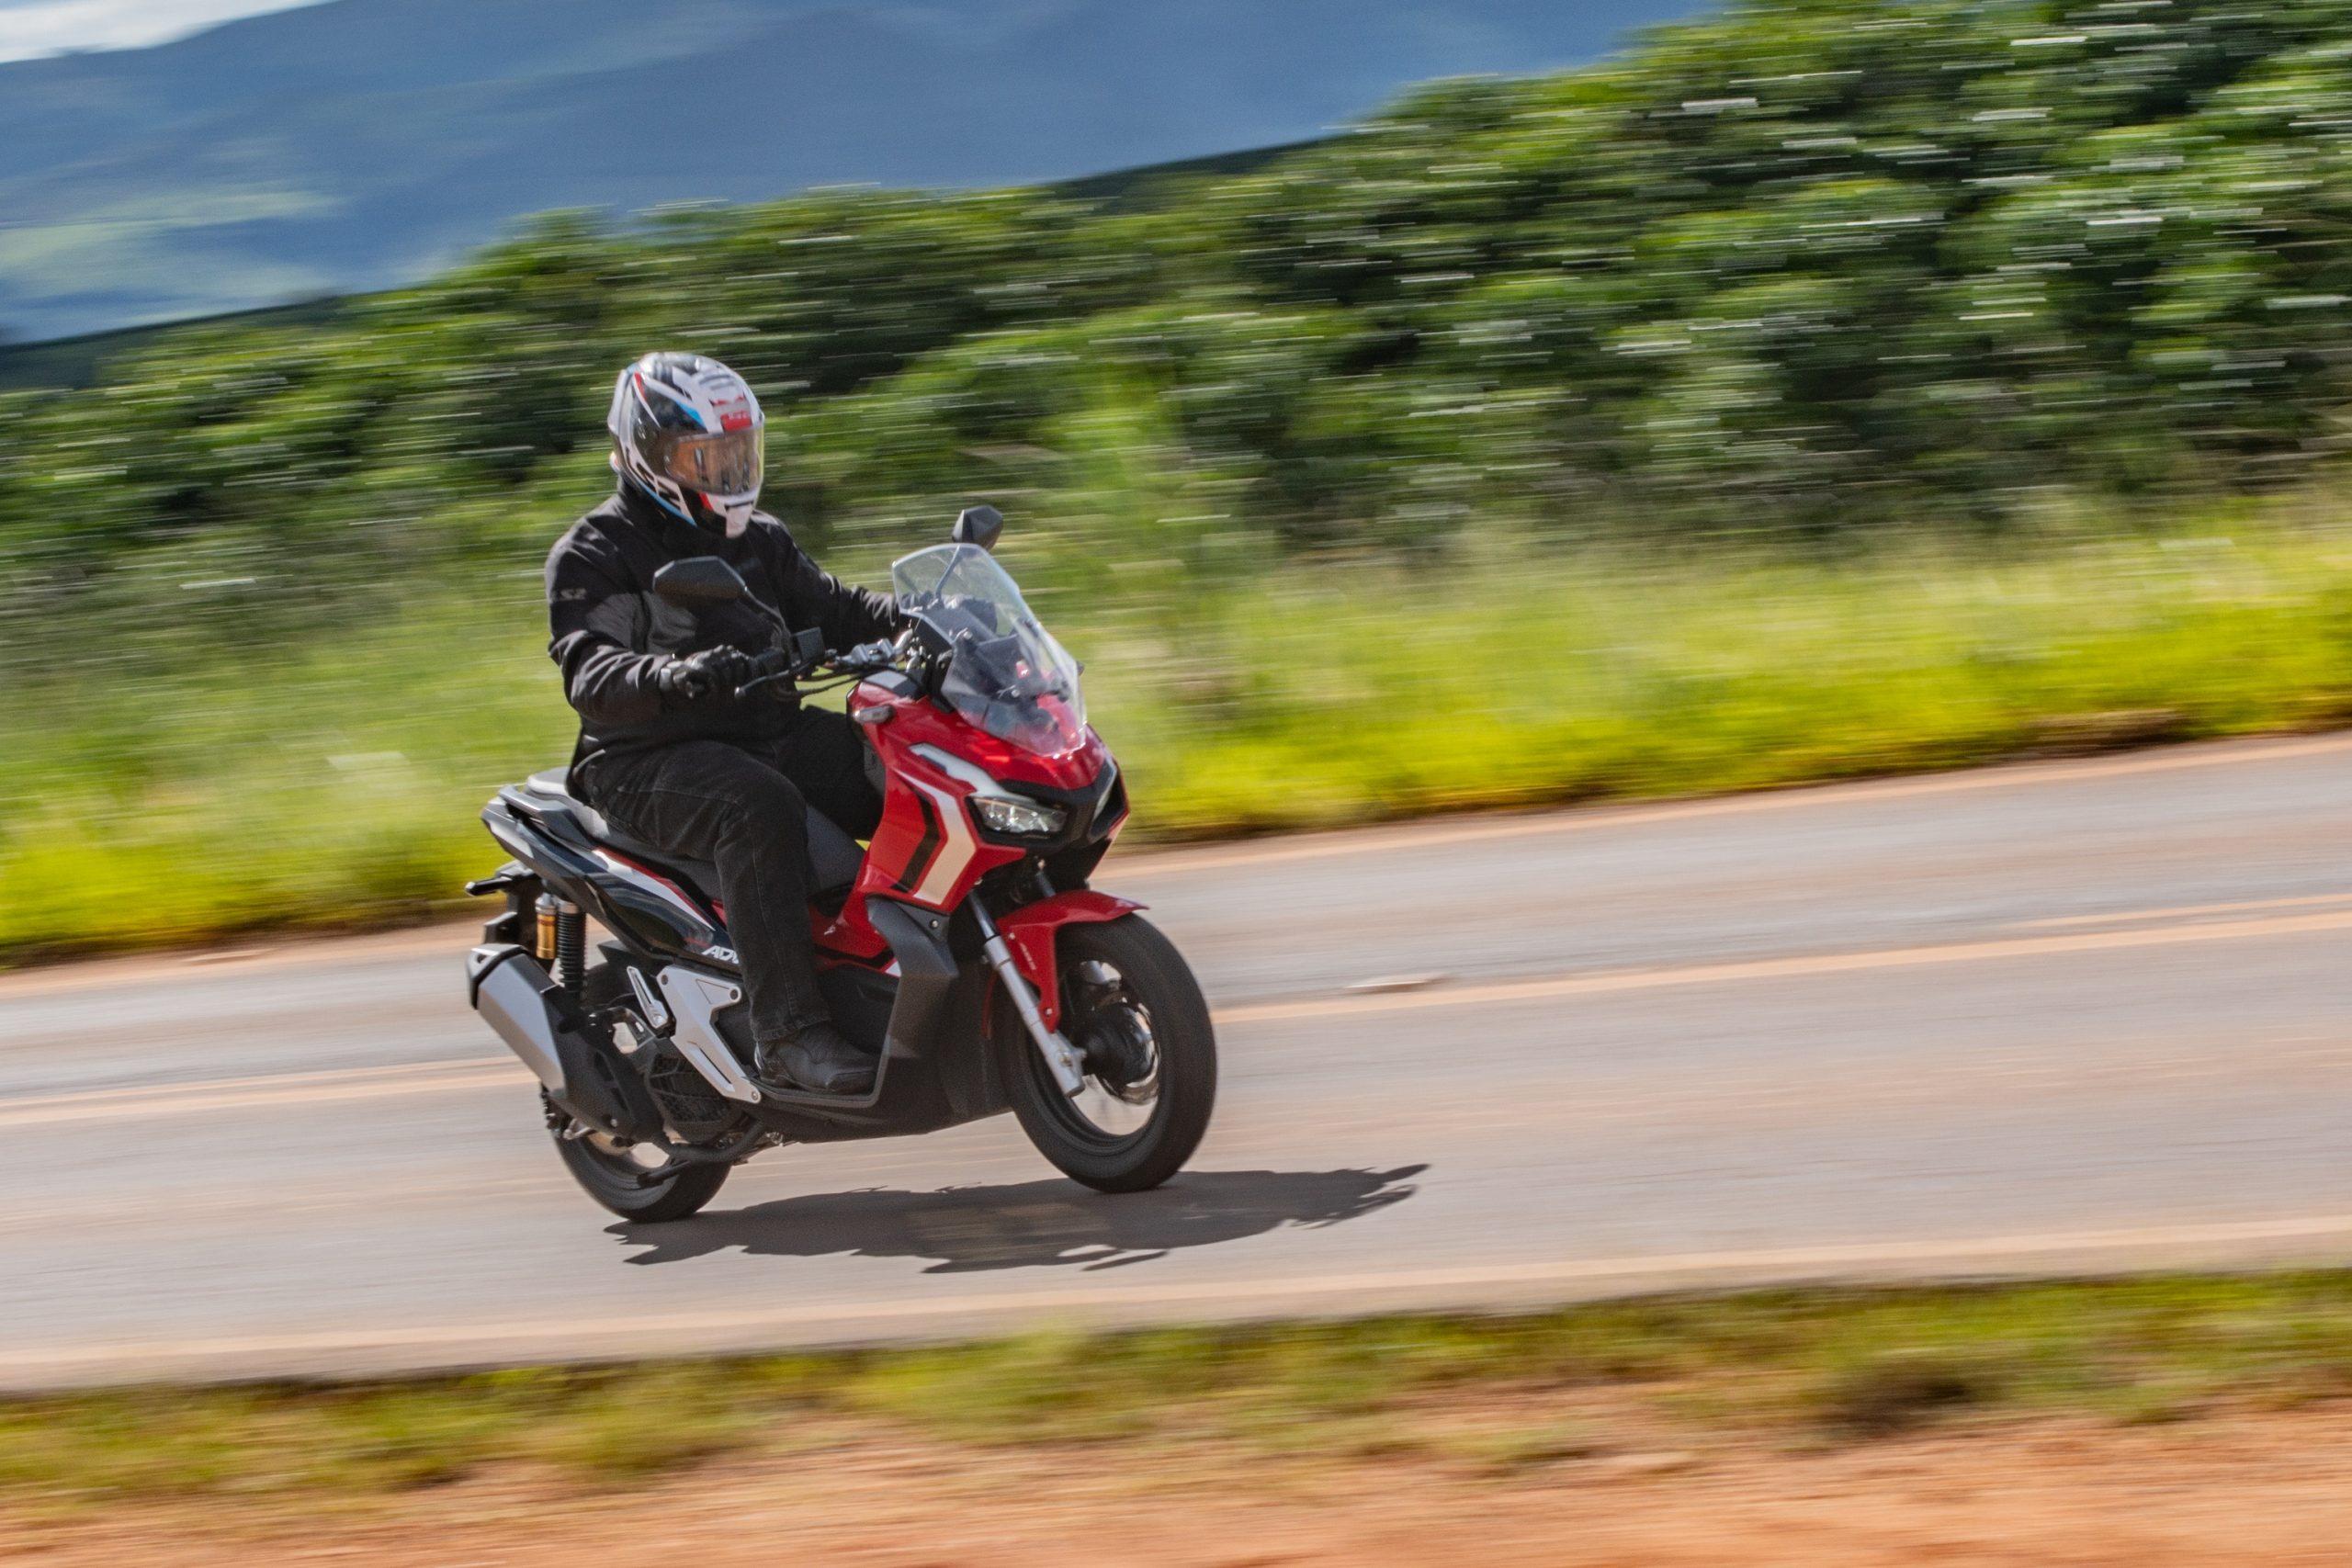 scooter honda adv 150 impressoes 12